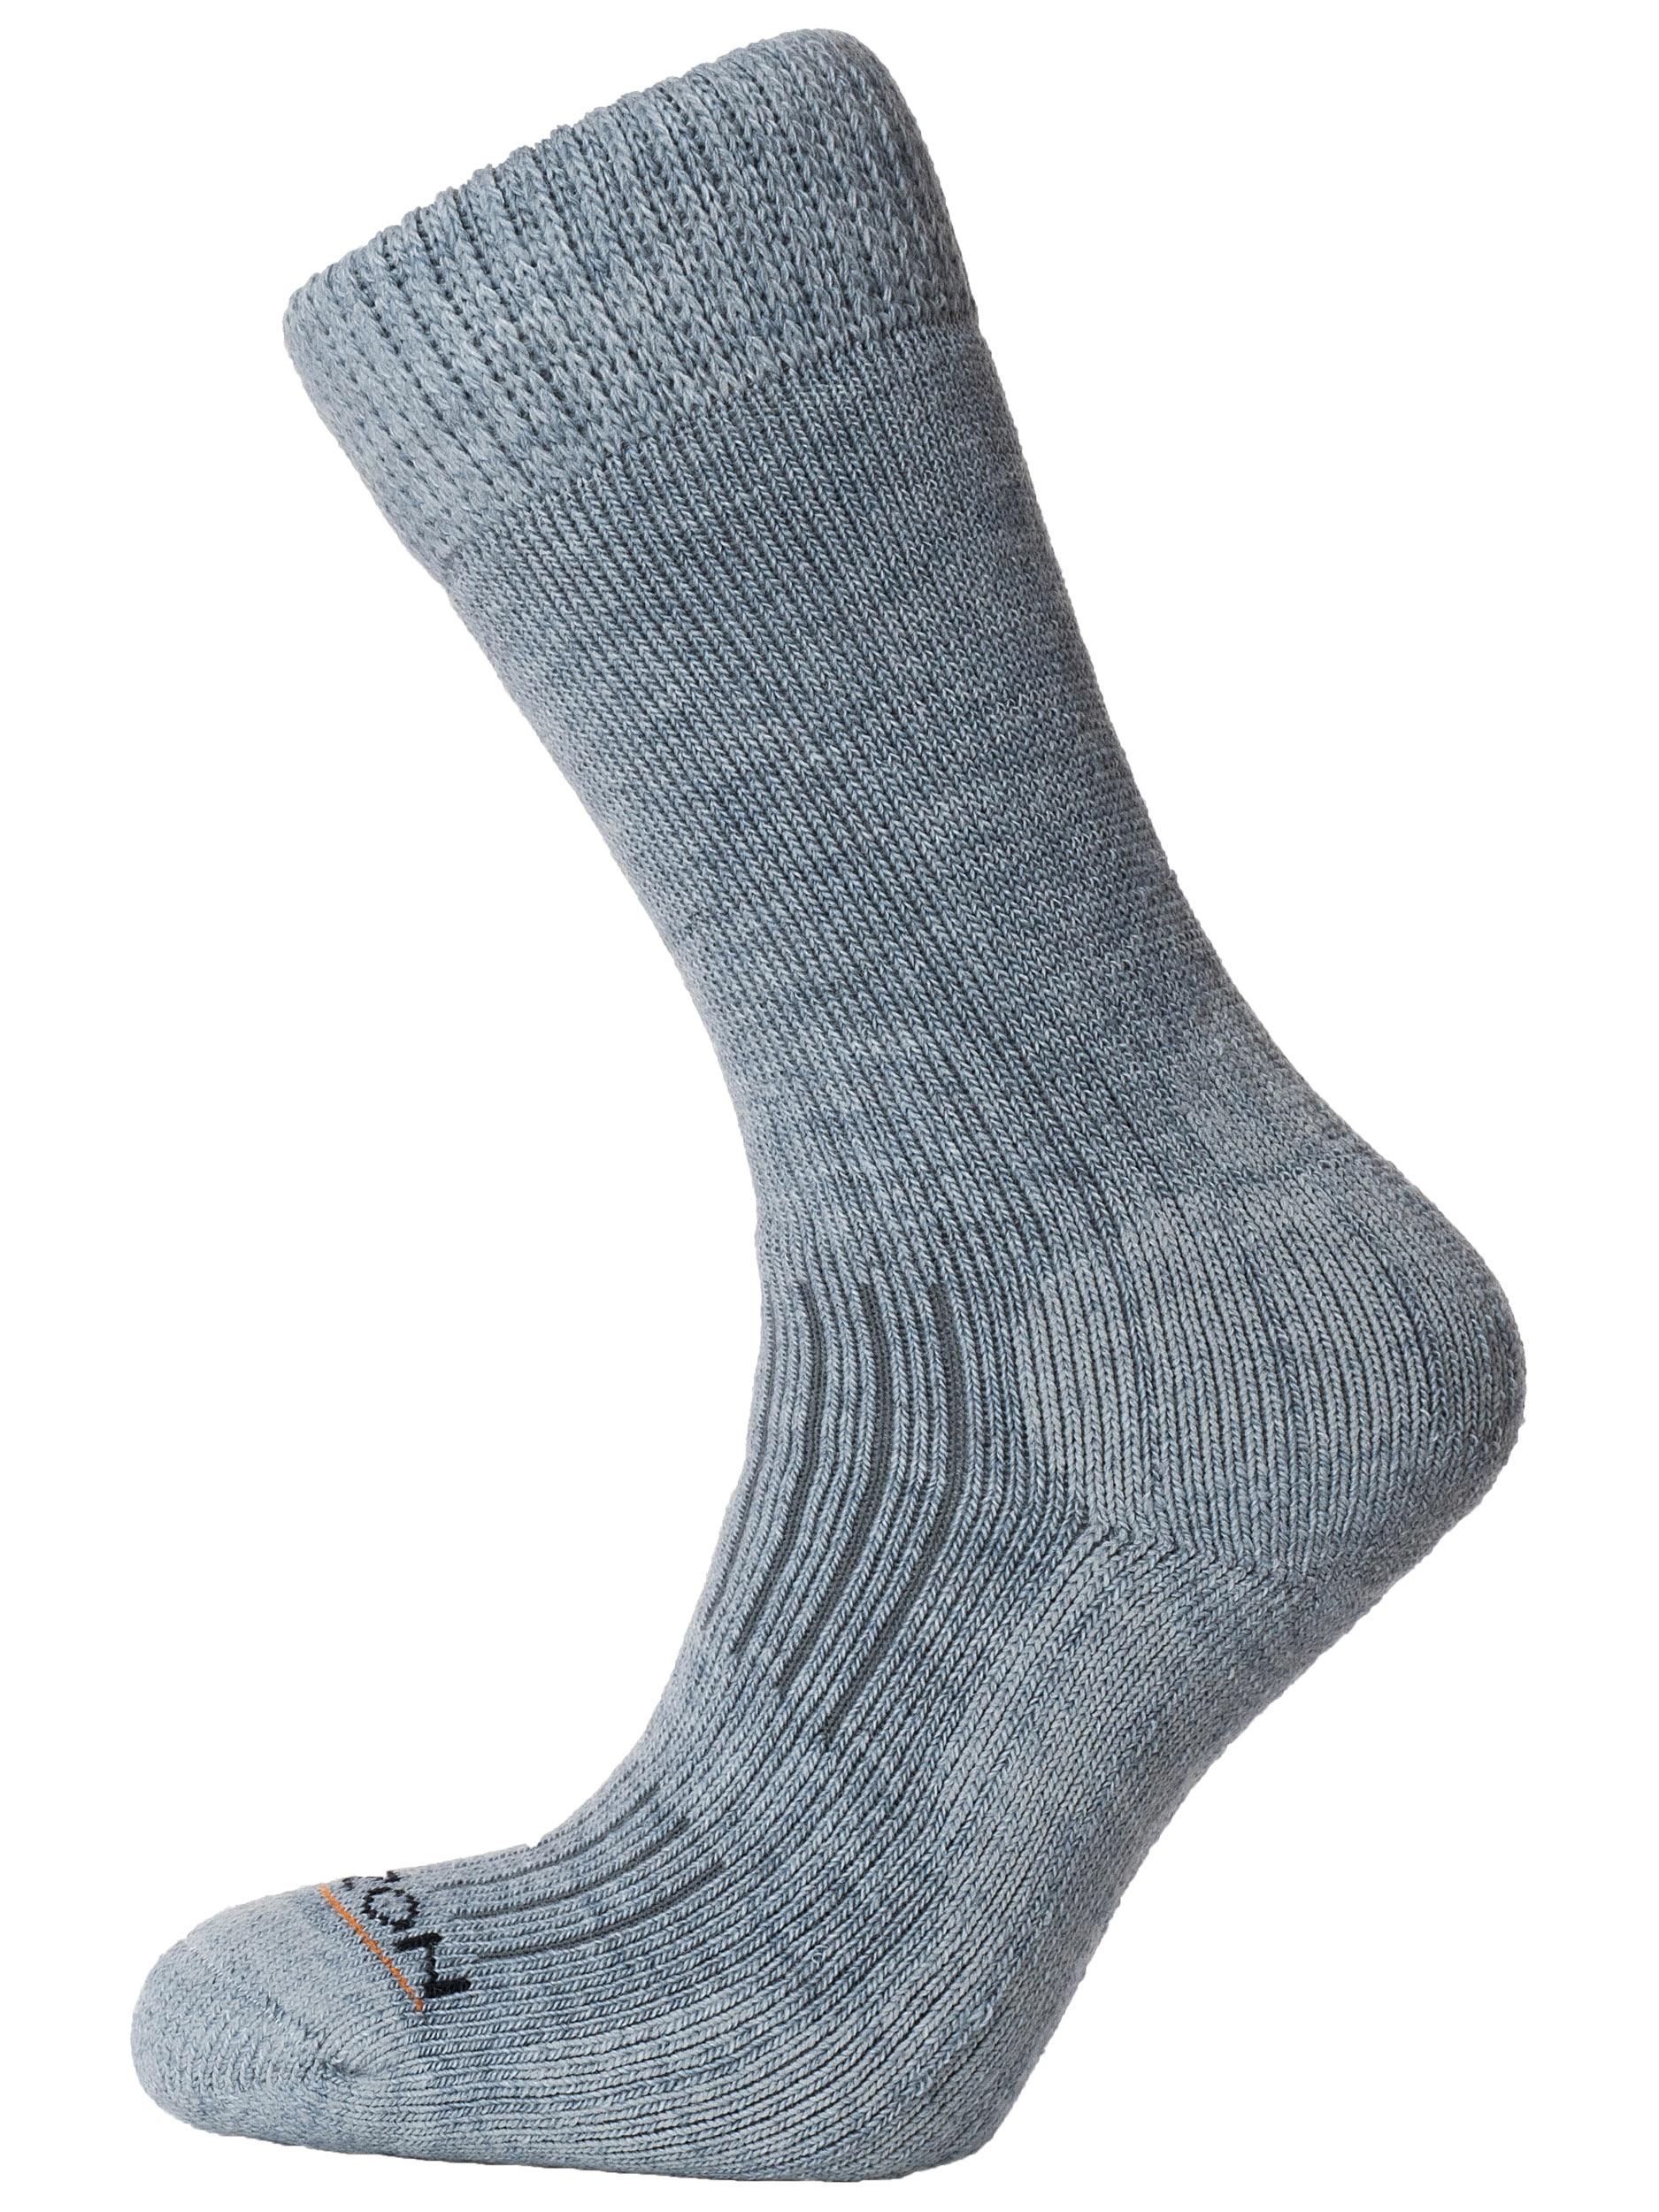 Performance County Cricket Socks Grey